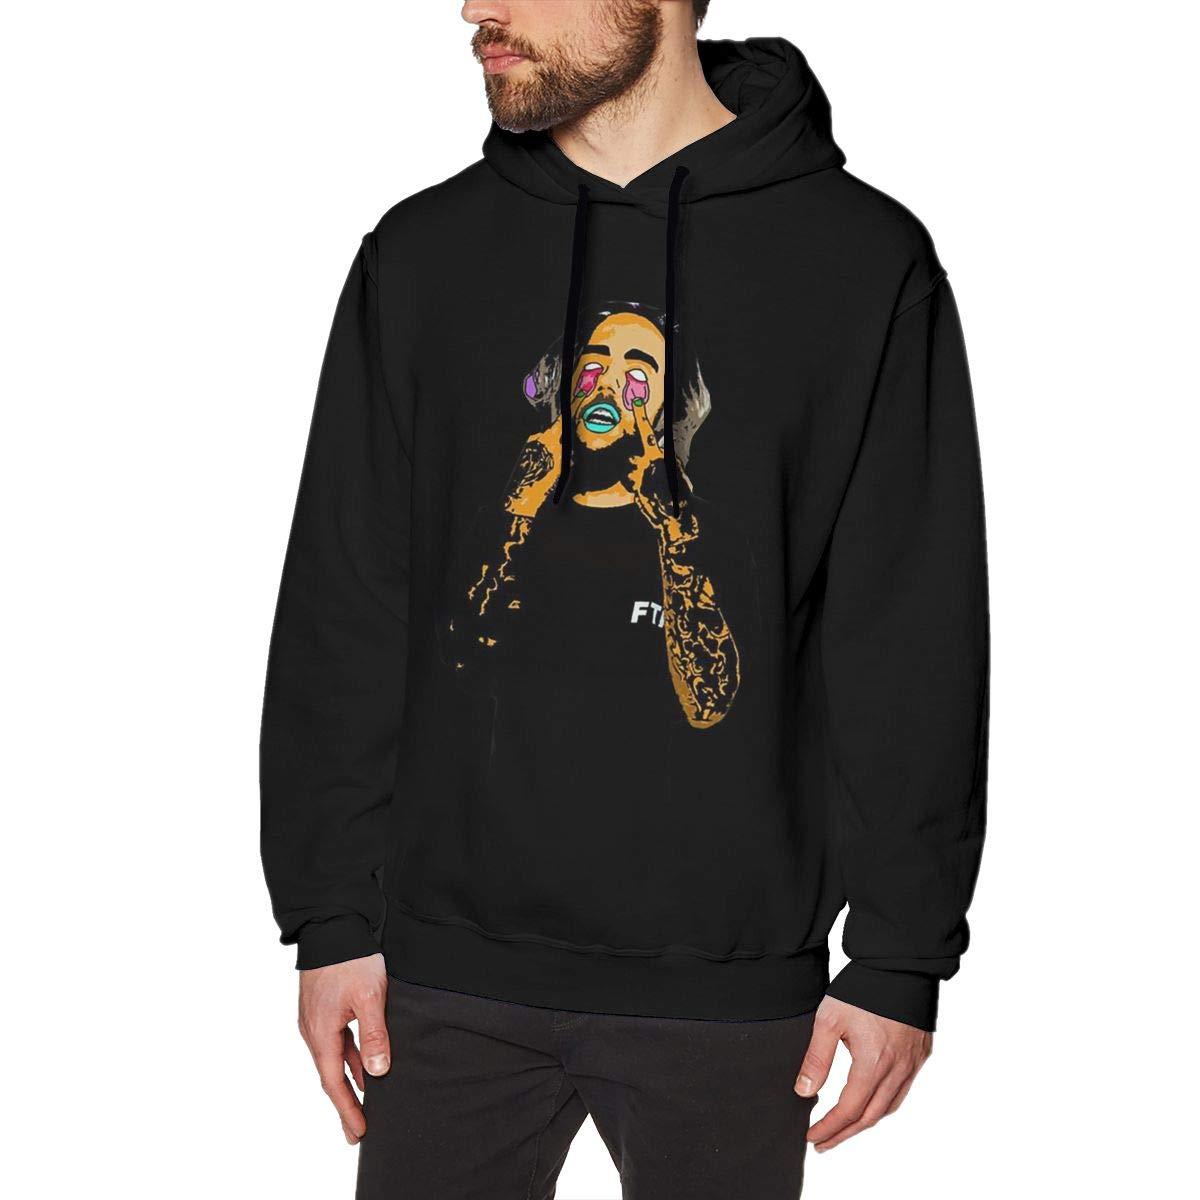 Mens Hooded Sweatshirt Suicide Boys Fashion Classic Style Black